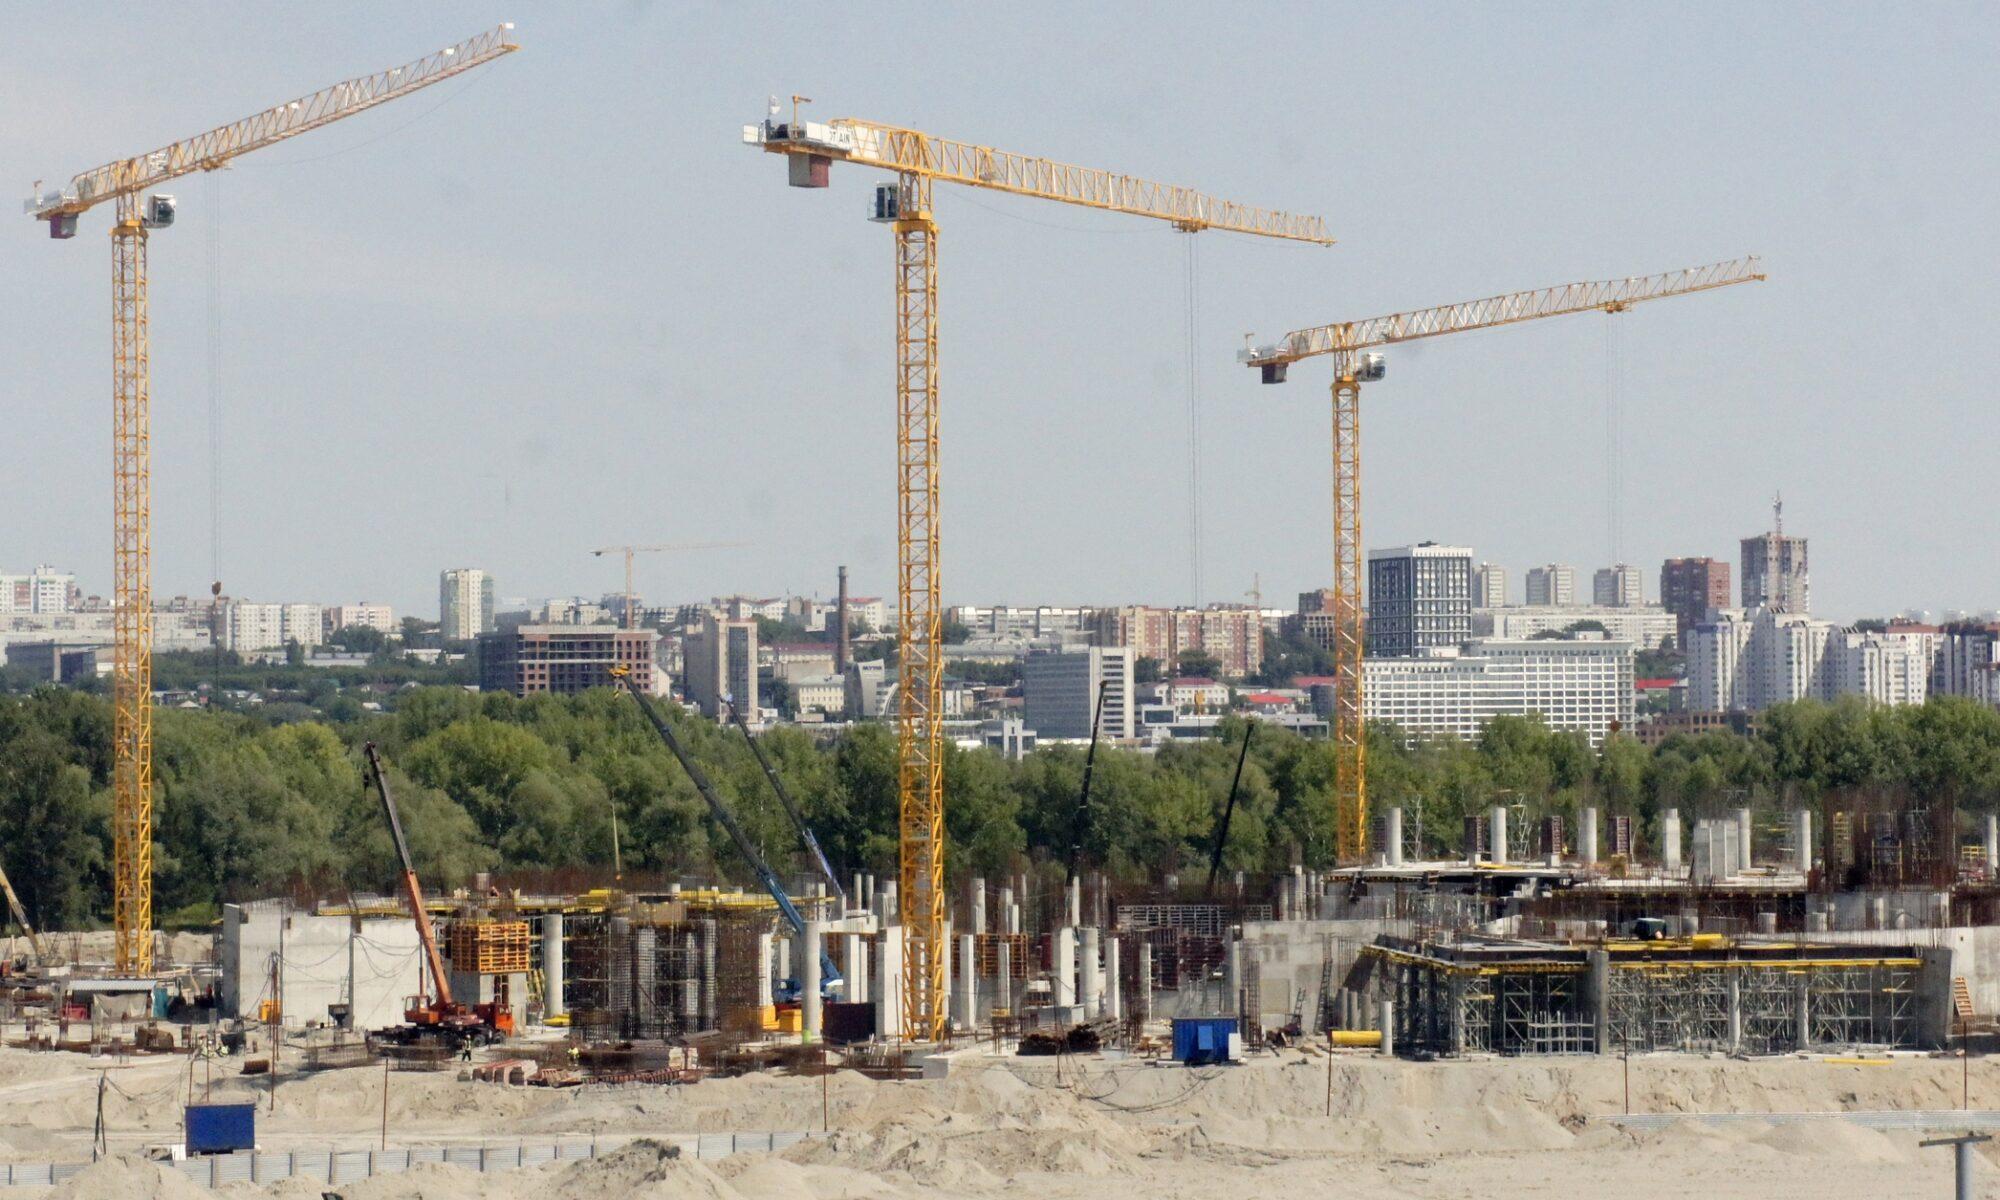 Строящийся ЛДС на левом берегу Оби в Новосибирске. Фото автора